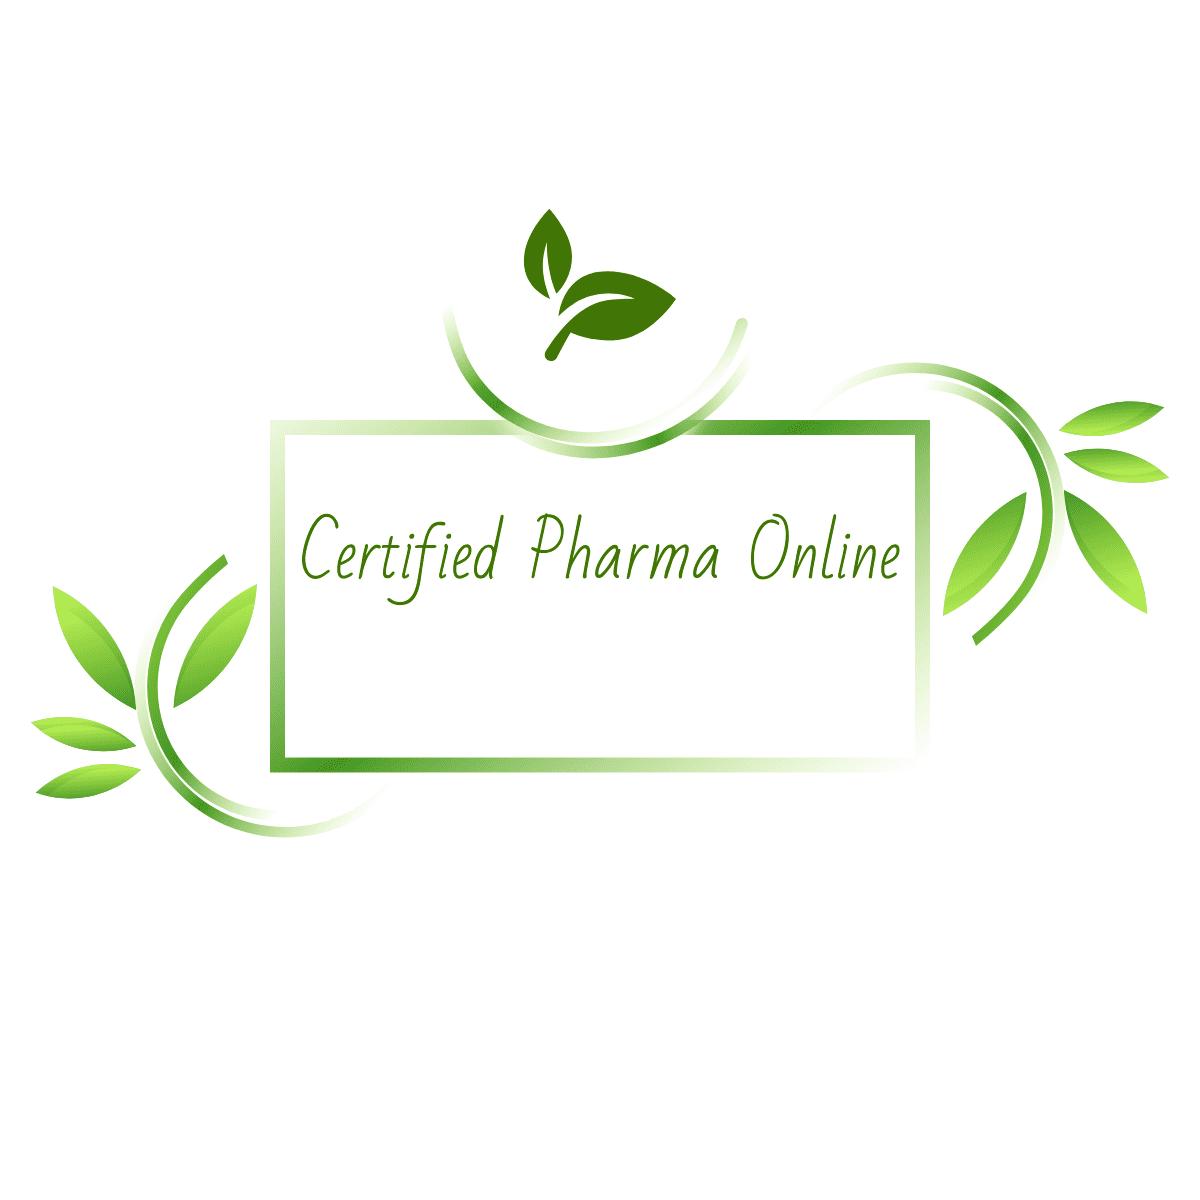 Certified Pharma Online